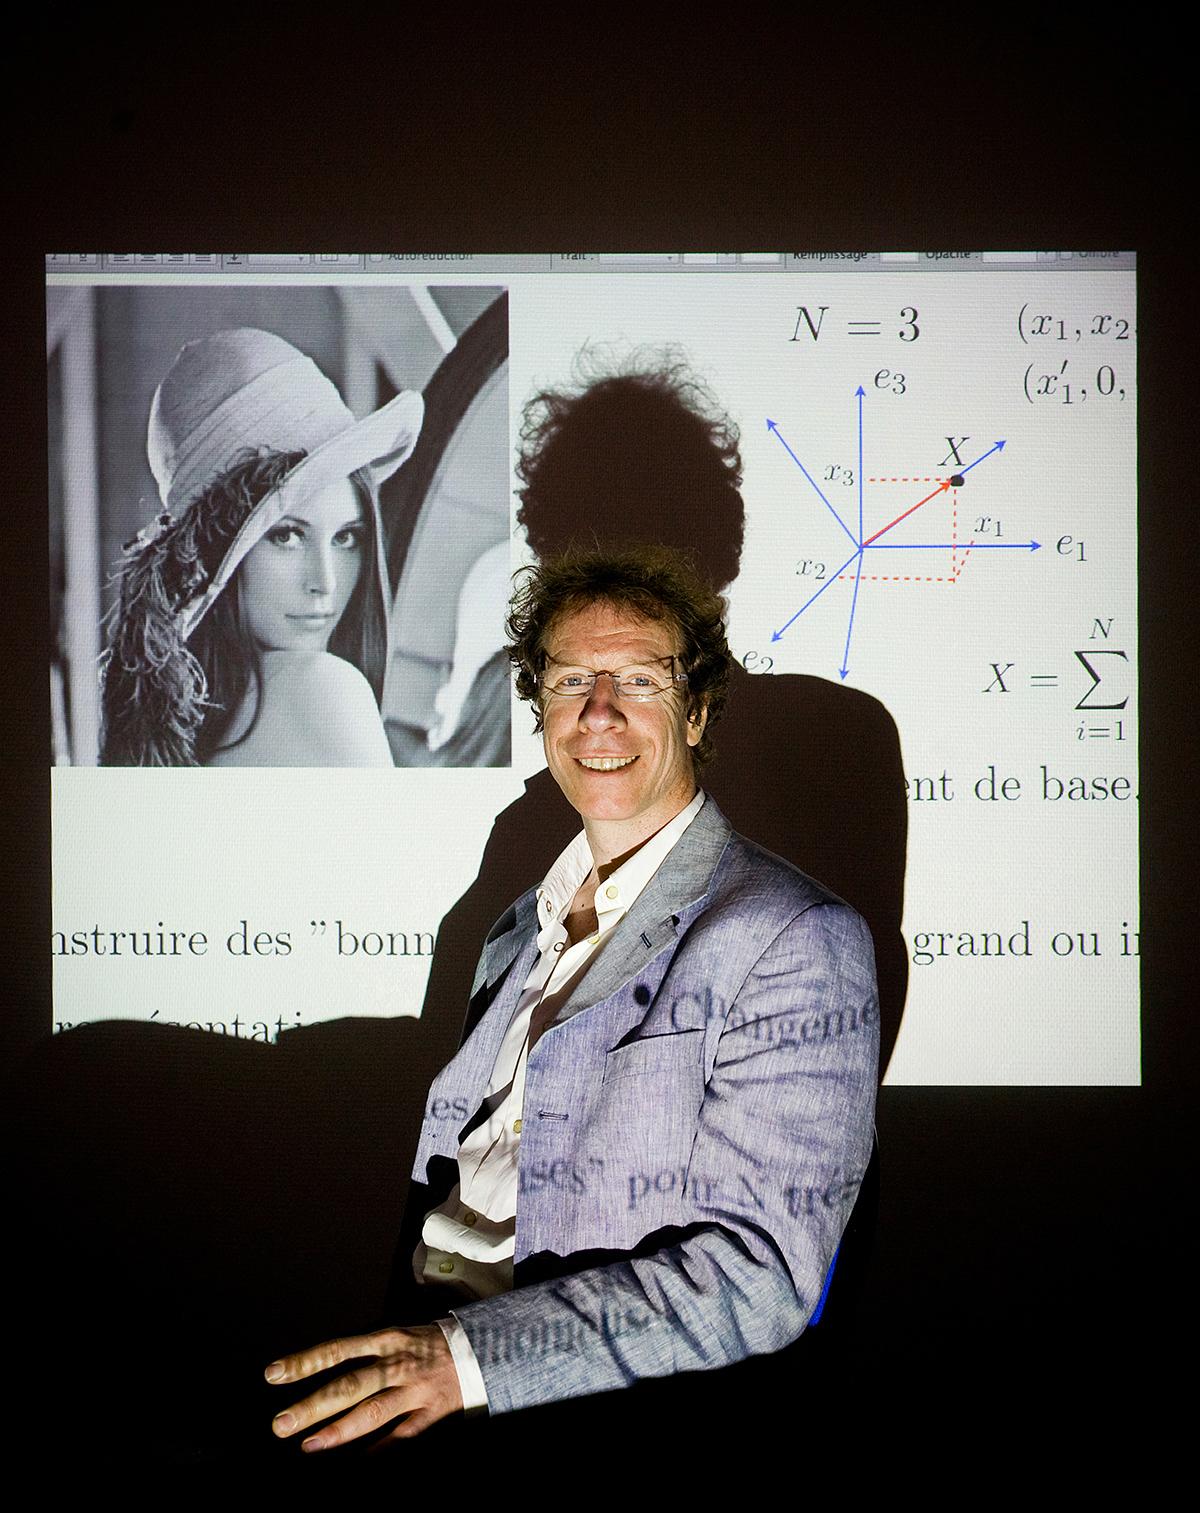 Stéphane Mallat